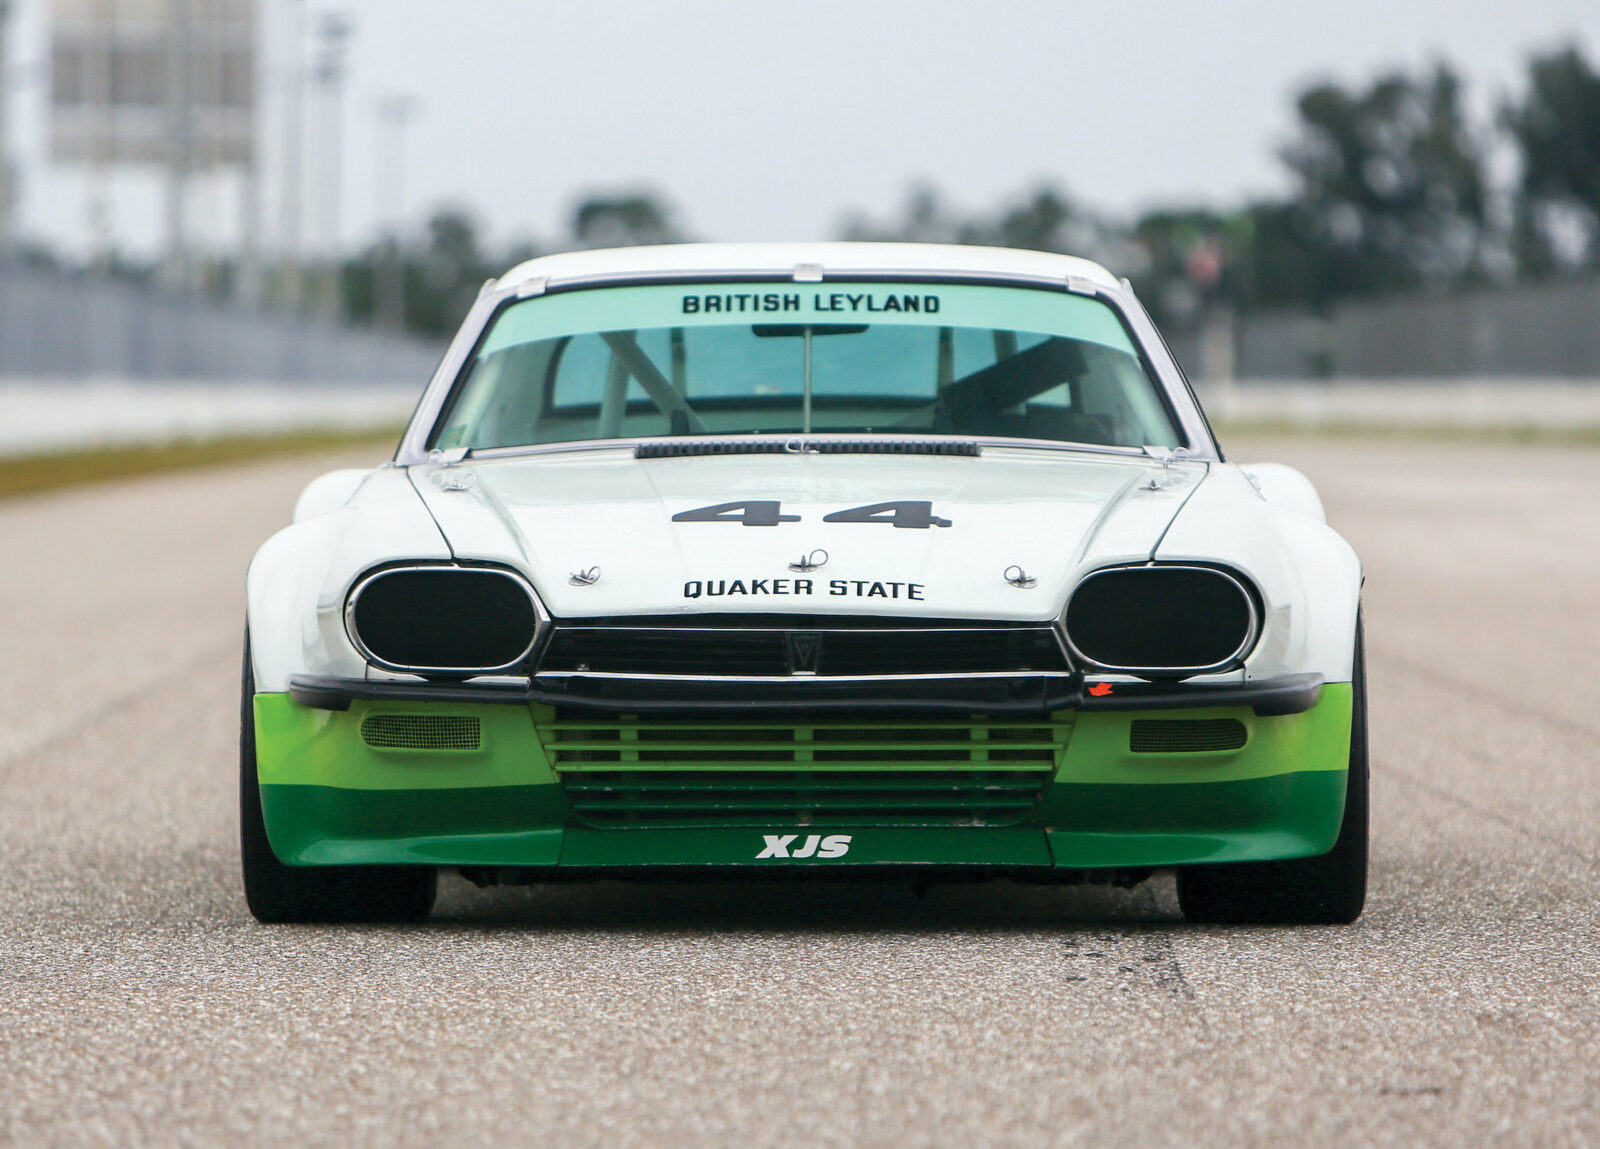 Jaguar XJS Group 44 Trans-Am Car